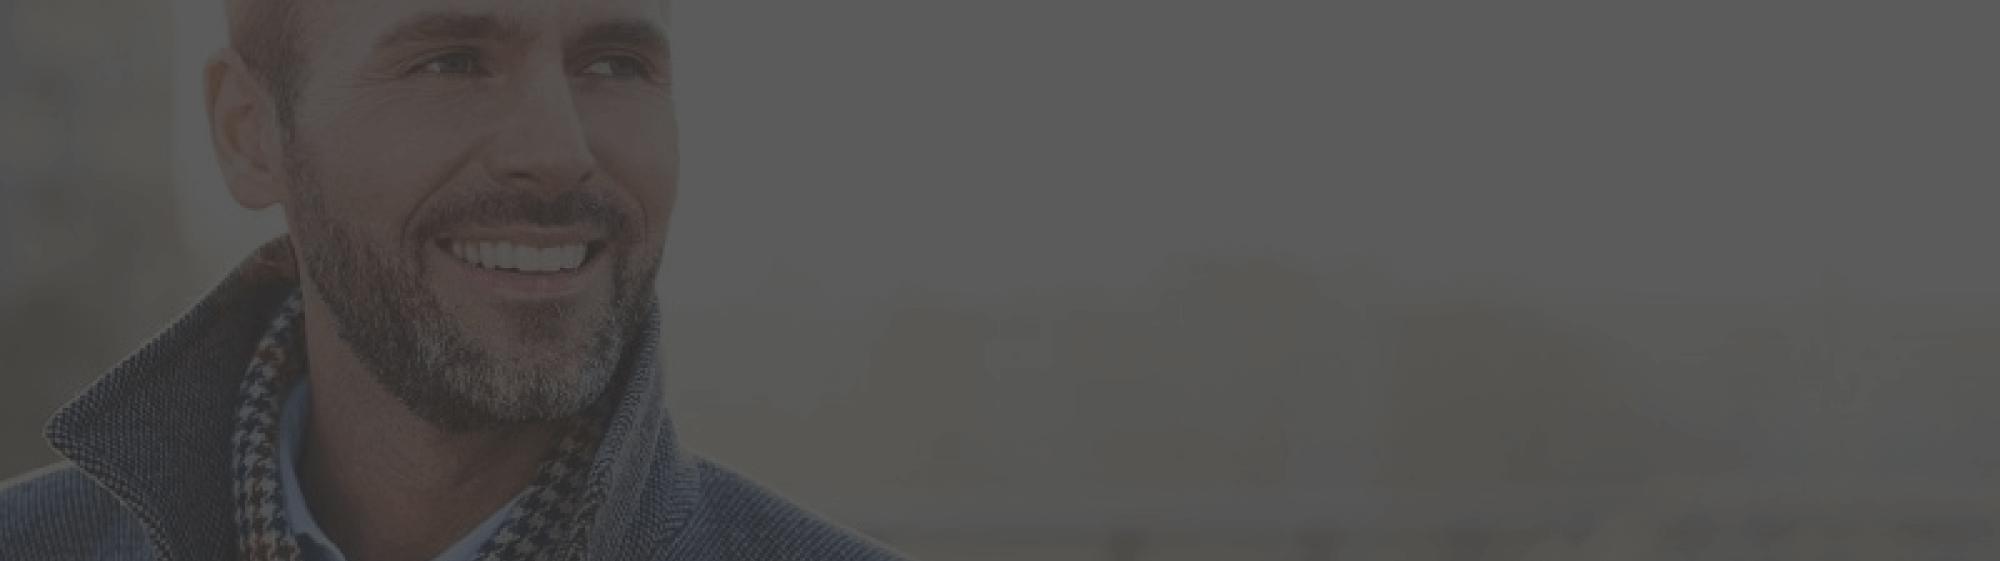 Remi - banner -JustUno Shopify Integration